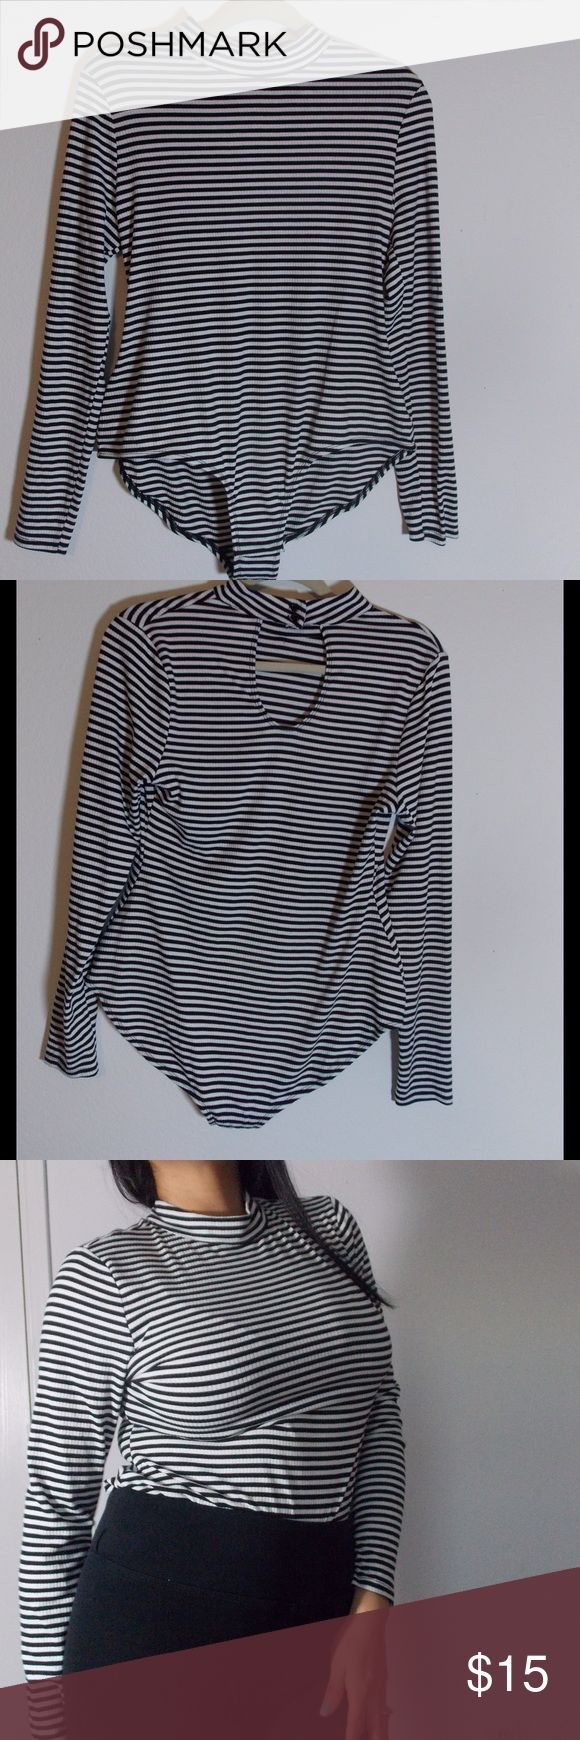 Stripes Body Suit Worn once 17 Sundays Other